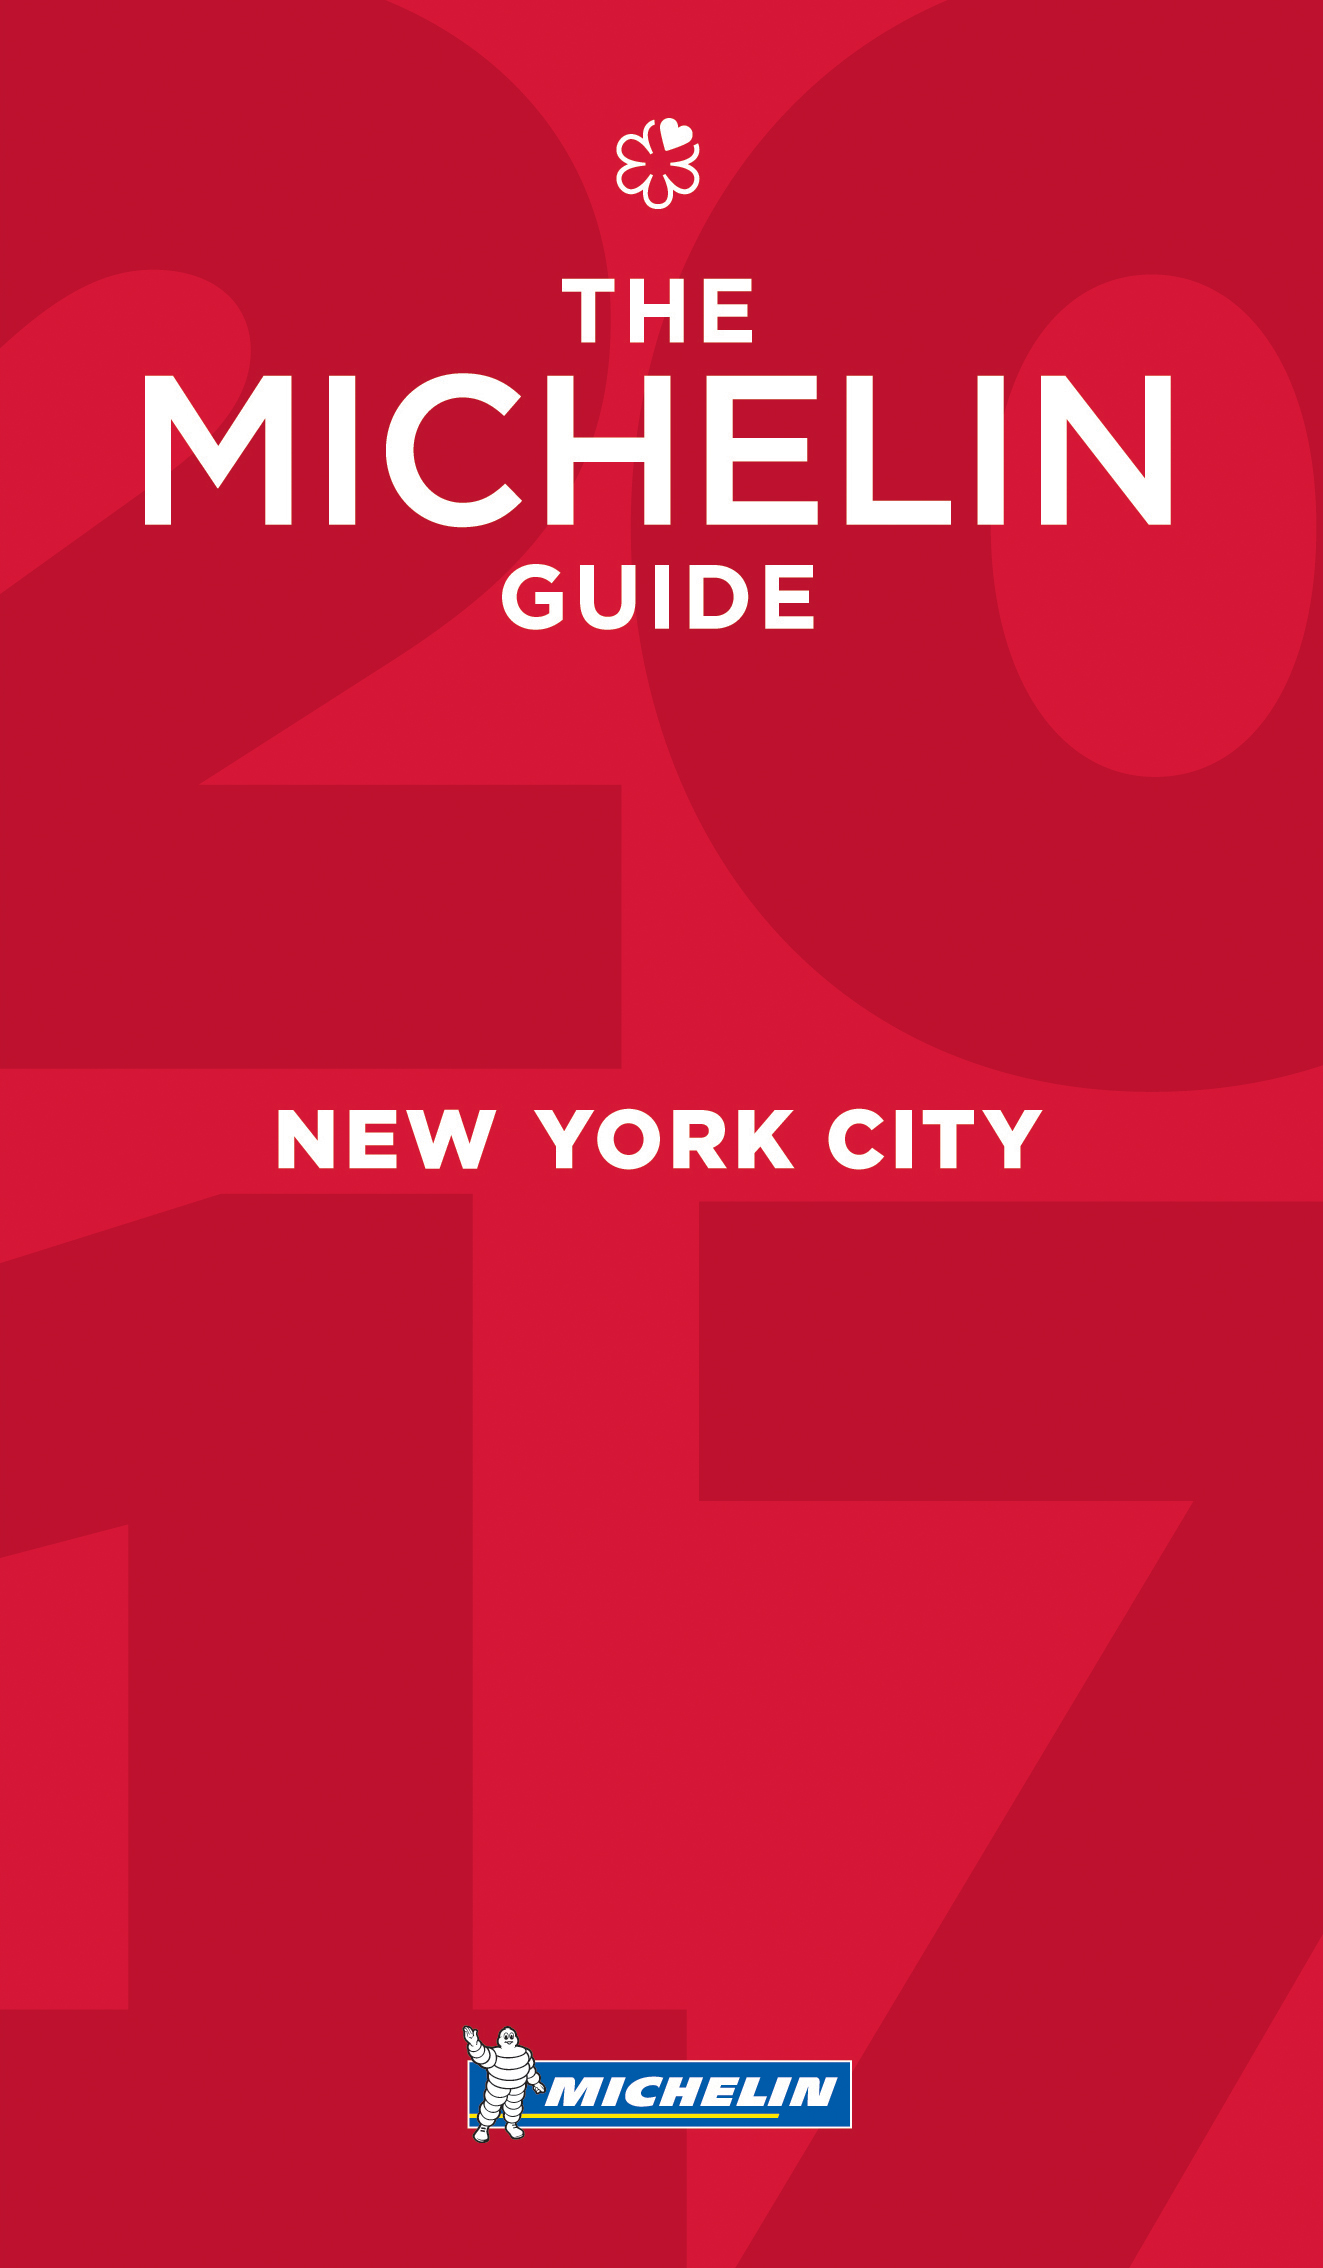 Michelin Guide Nyc 2017